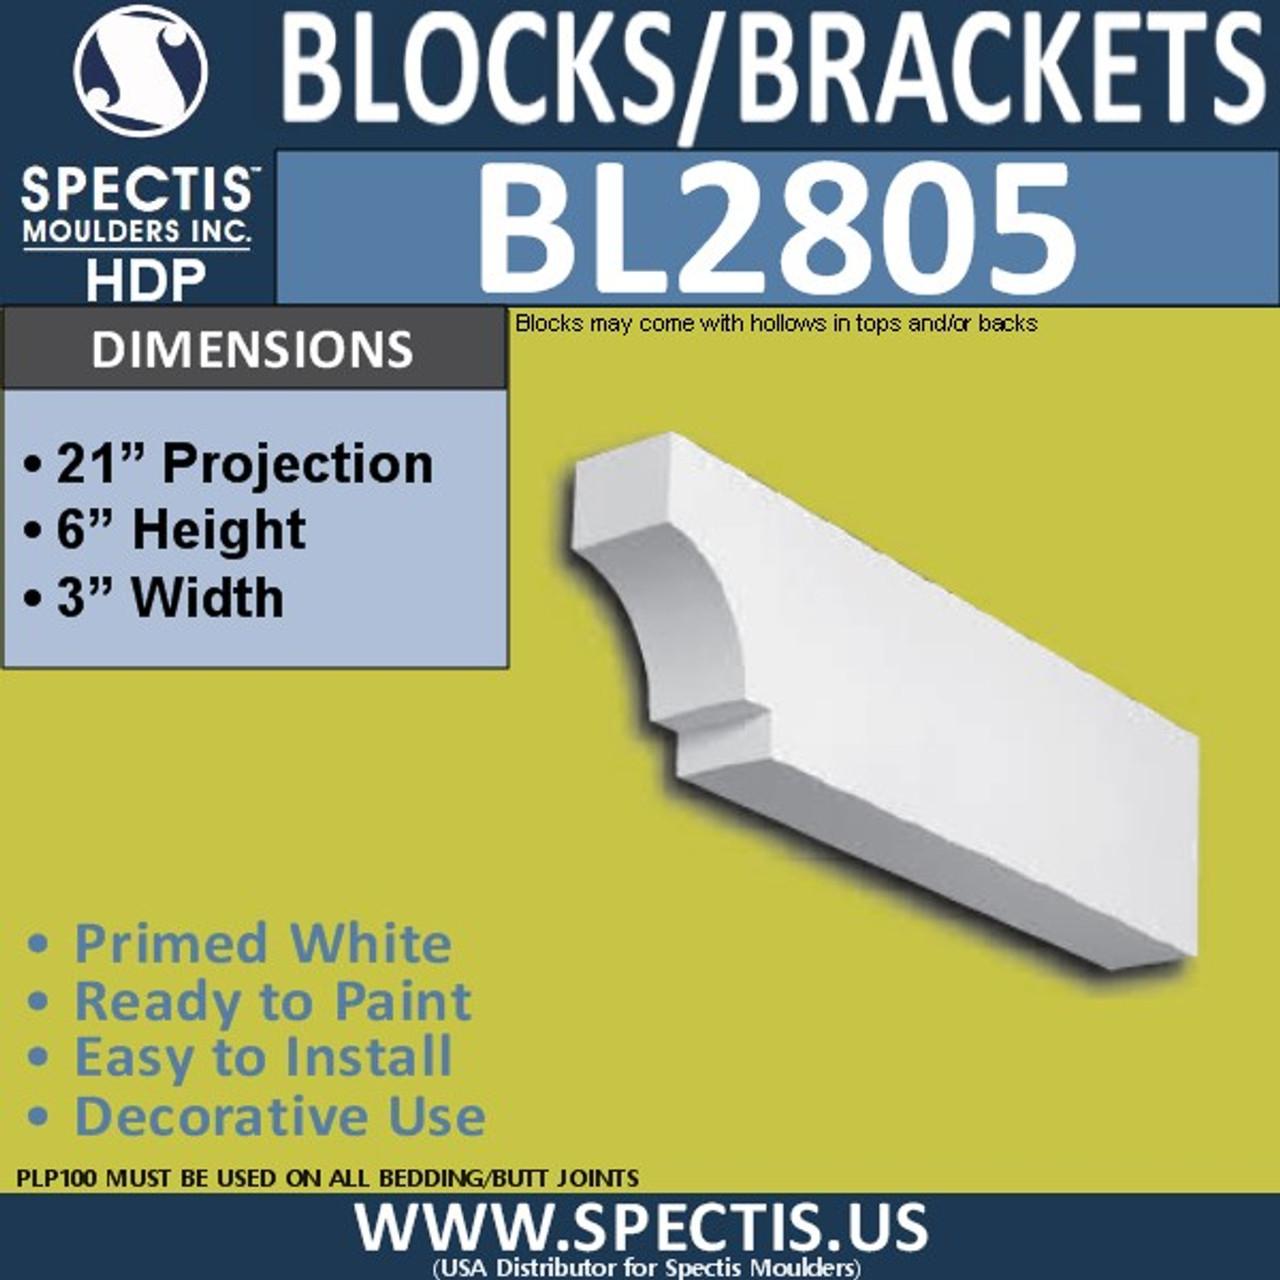 "BL2805 Eave Block or Bracket 3""W x 6""H x 21"" P"